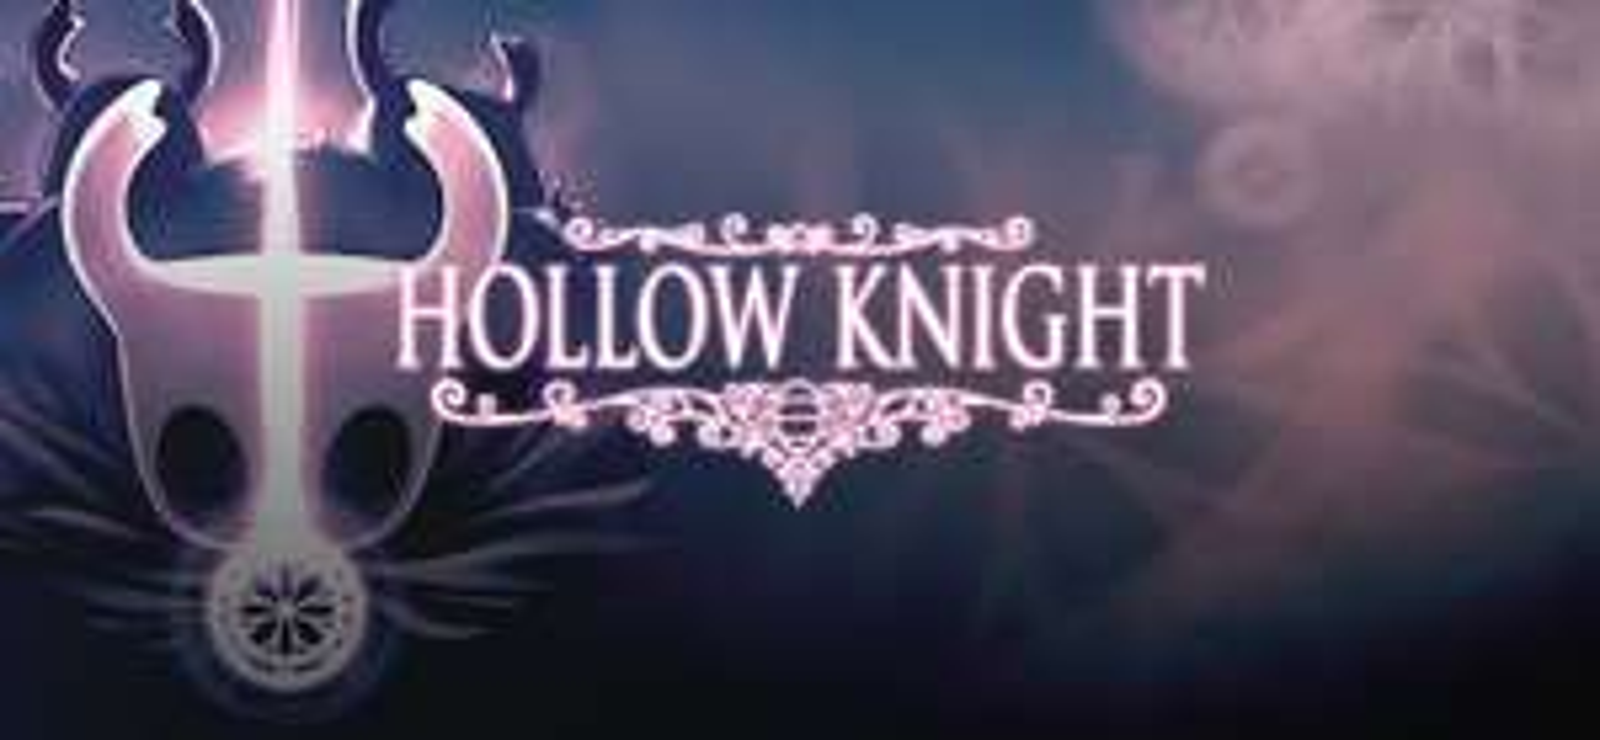 [gog.com] Angebot: Hollow Knight - DRM-frei [PC]